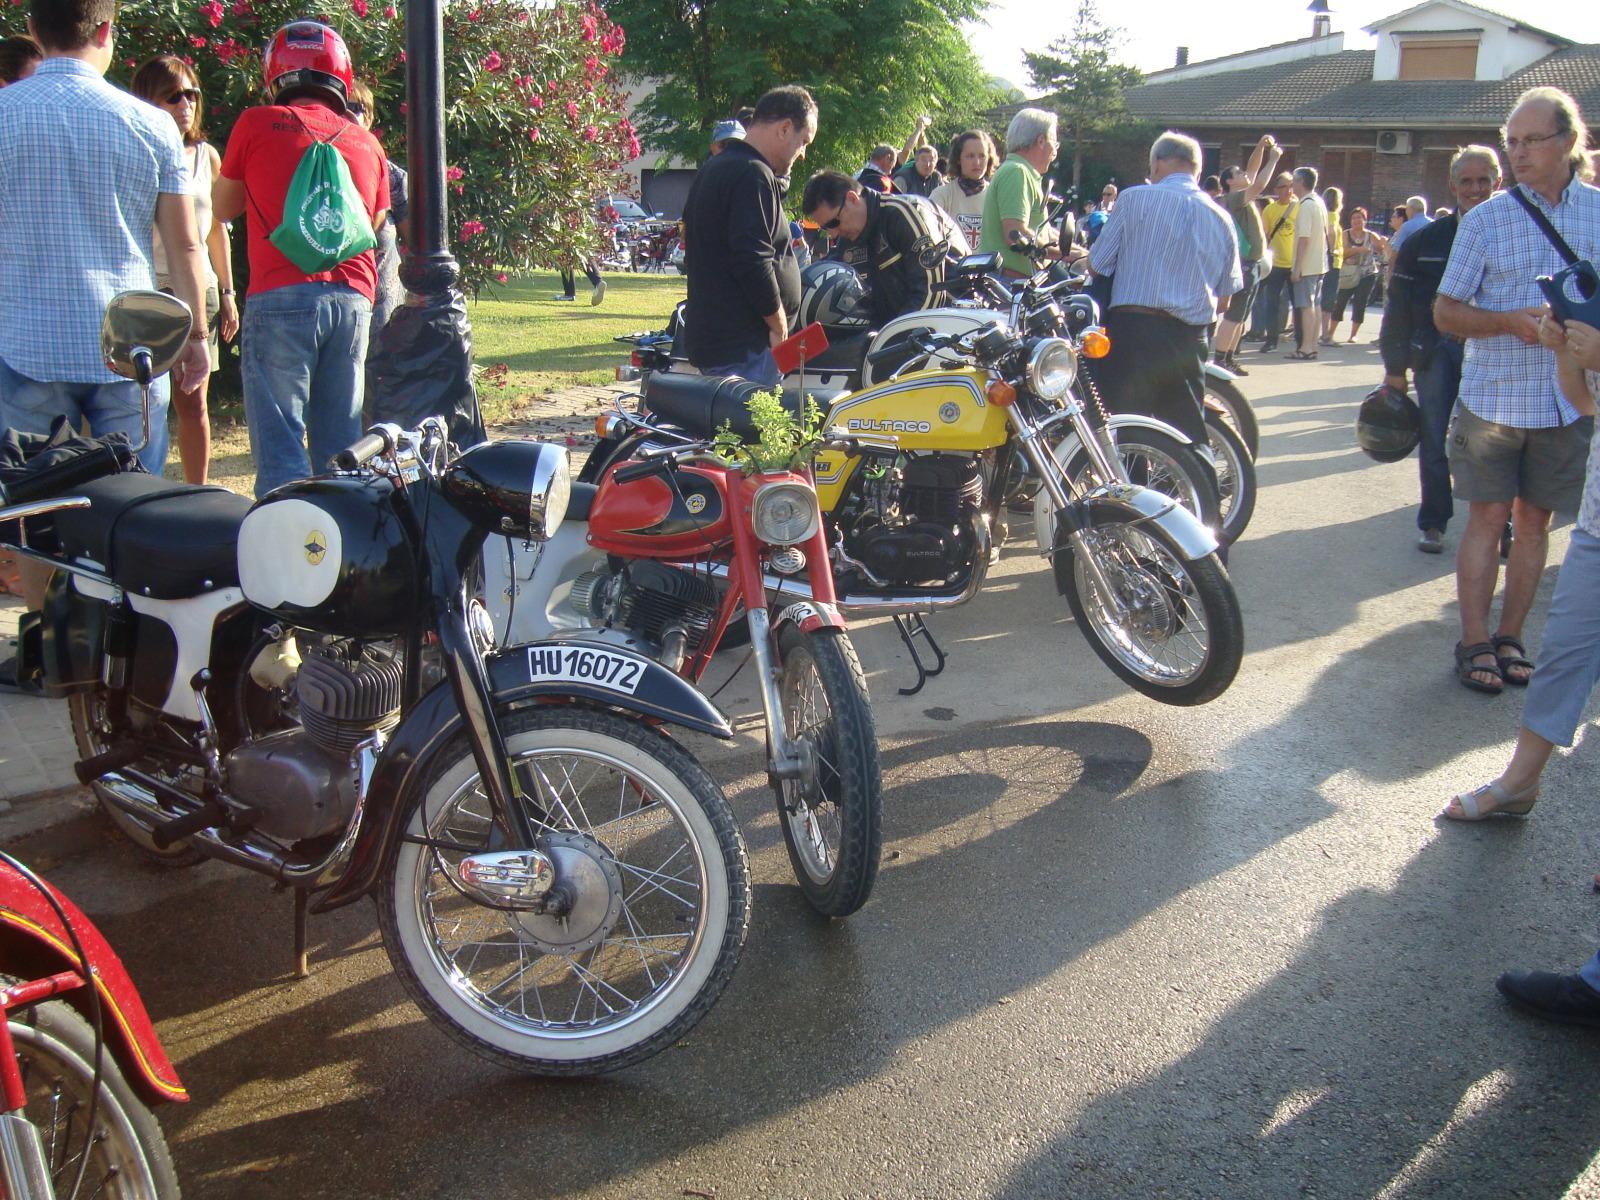 XI concentracion de motos antiguas en Alberuela de tubo (Huesca) 2u6d6rq